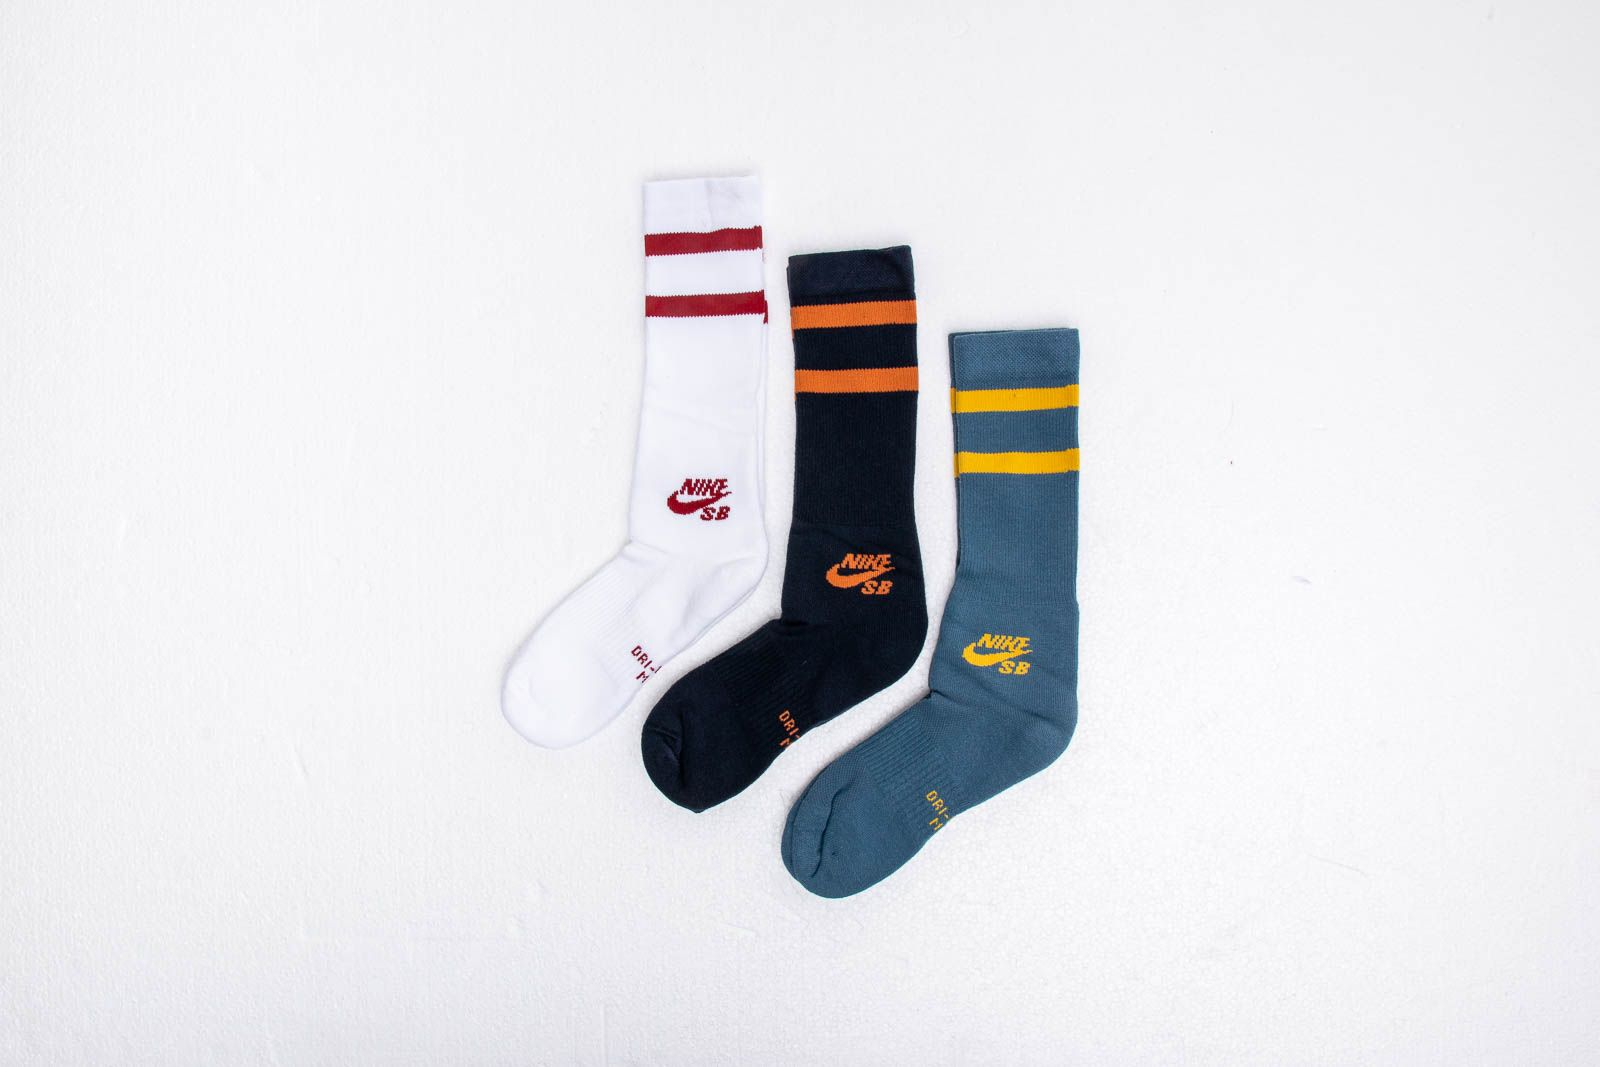 Nike SB 3-Pack Crew Socks